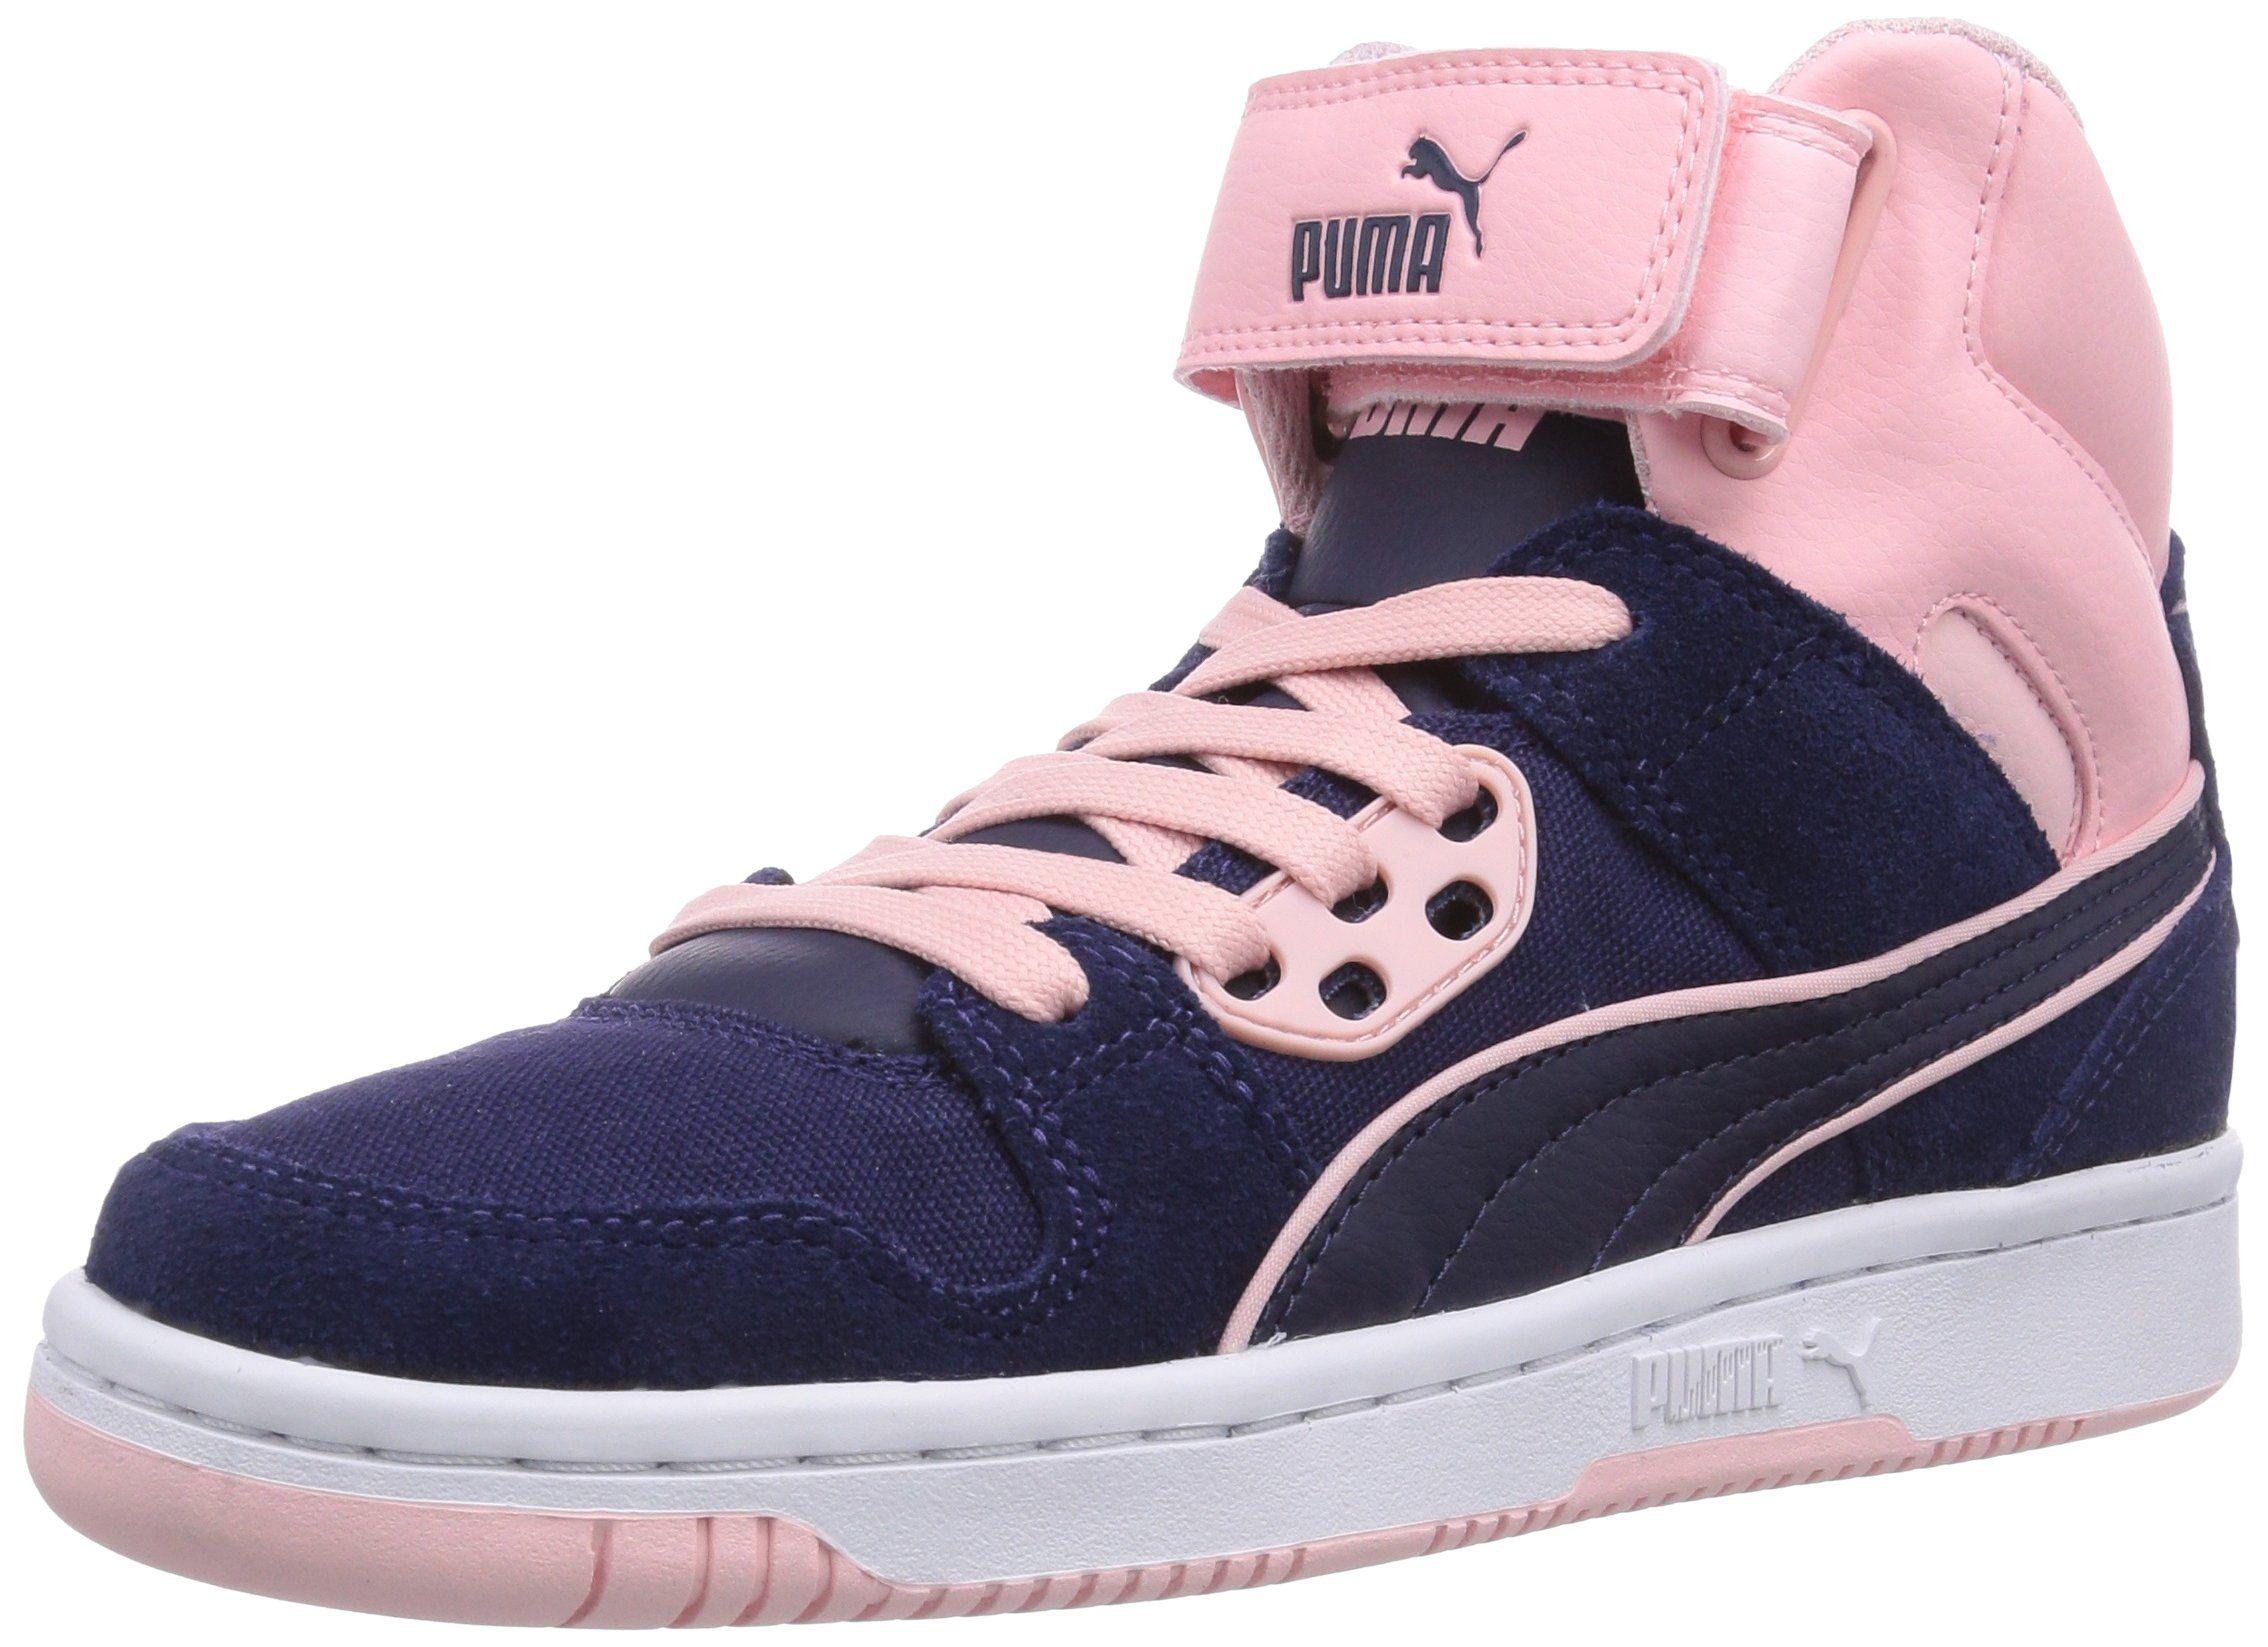 87235d080a7f6b Puma Puma Rebound Street CV